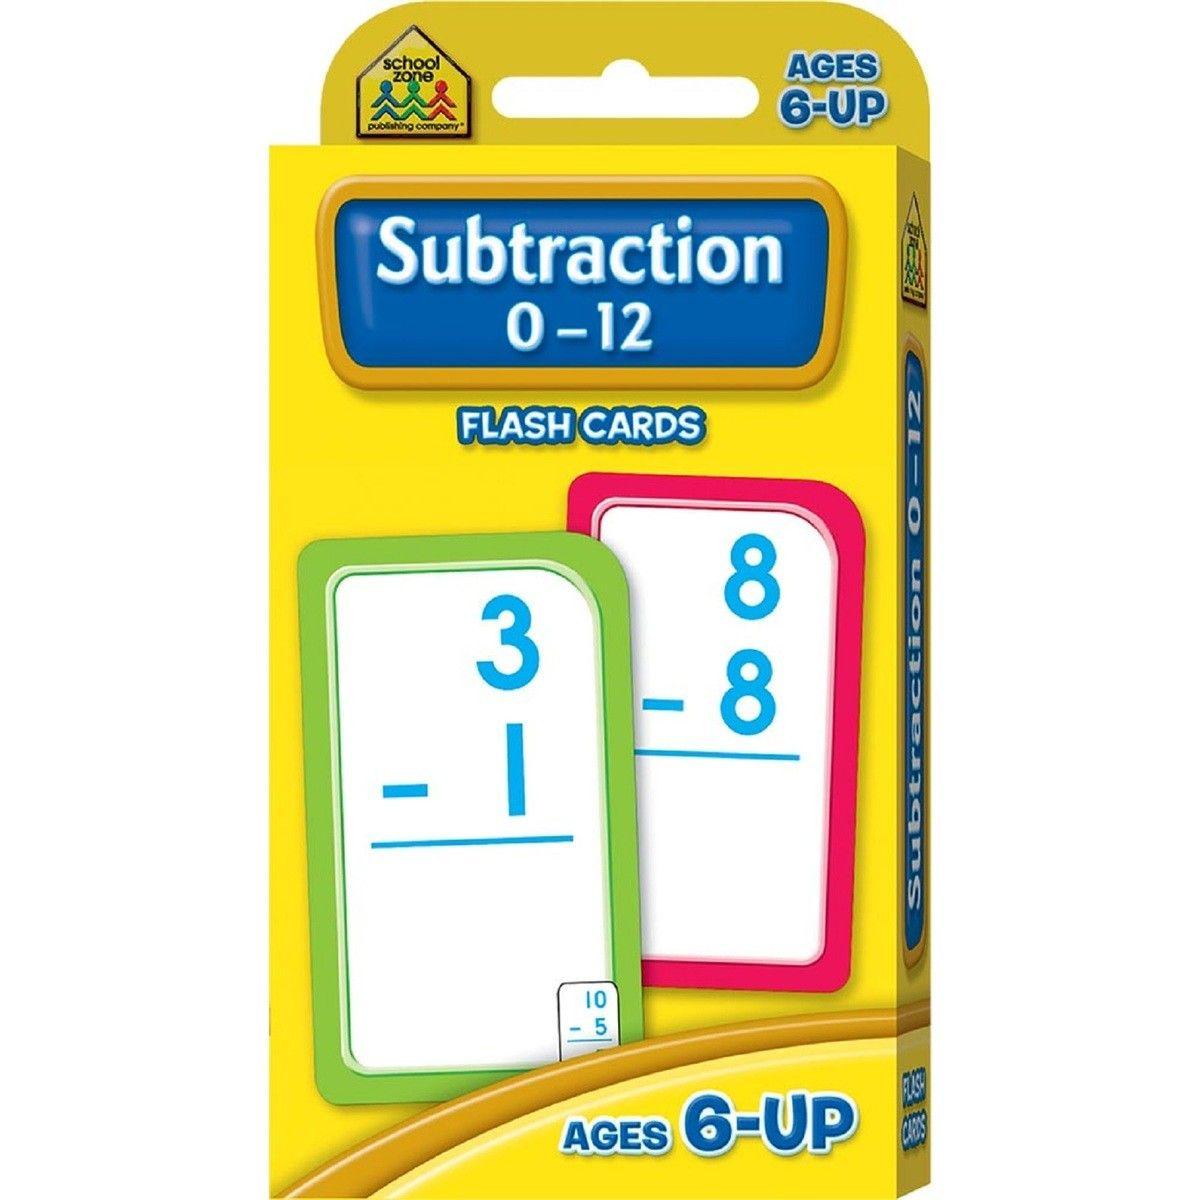 School Zone Subtraction 0-12 Flash Cards | Flashcards